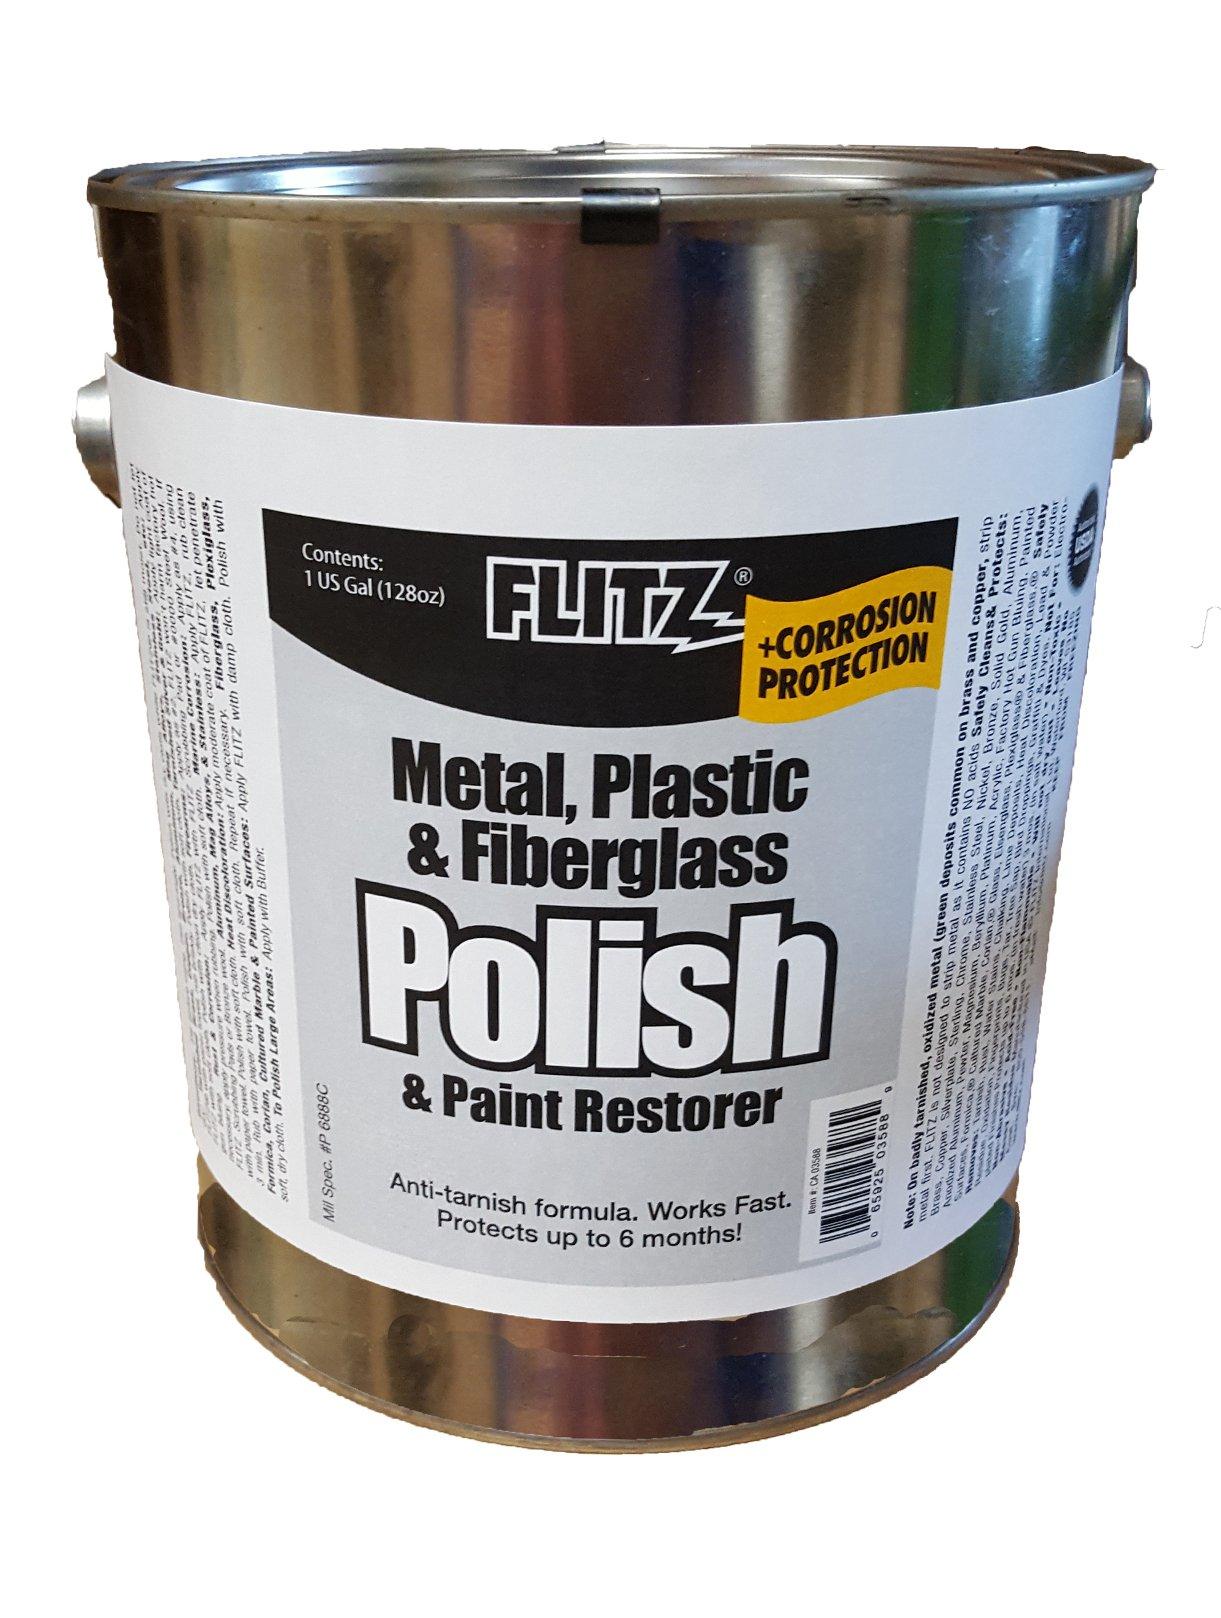 Flitz CA 03588 Blue Metal, Plastic and Fiberglass Polish Paste, 1 Gallon Can